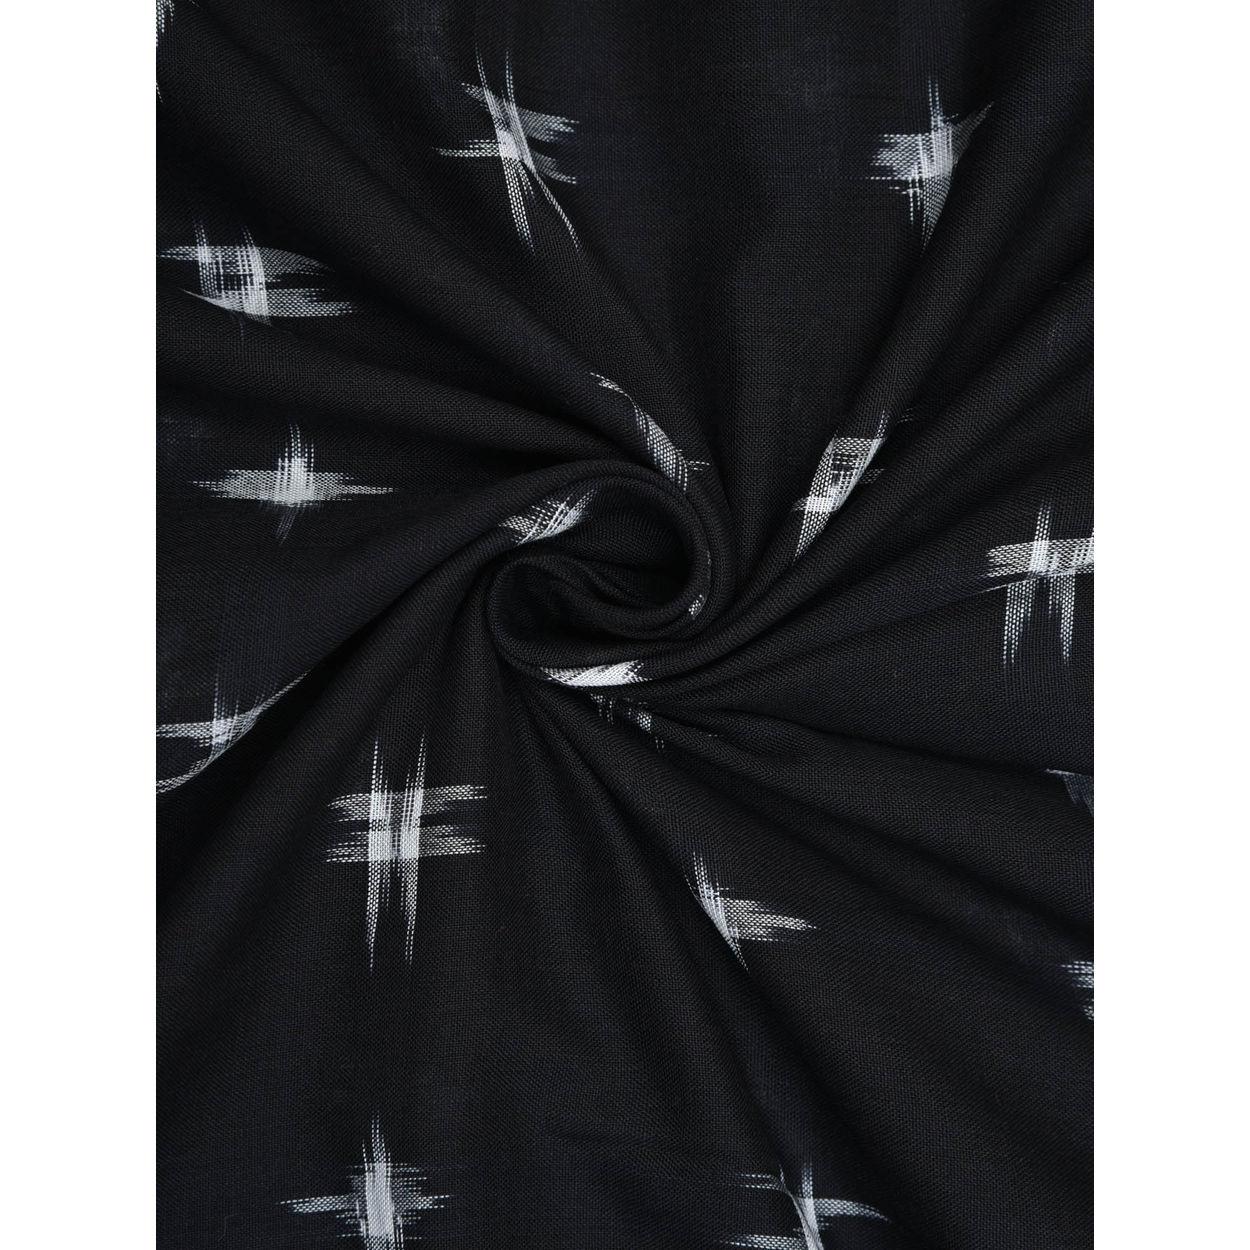 Ikat Cotton Handloom Fabric F0109